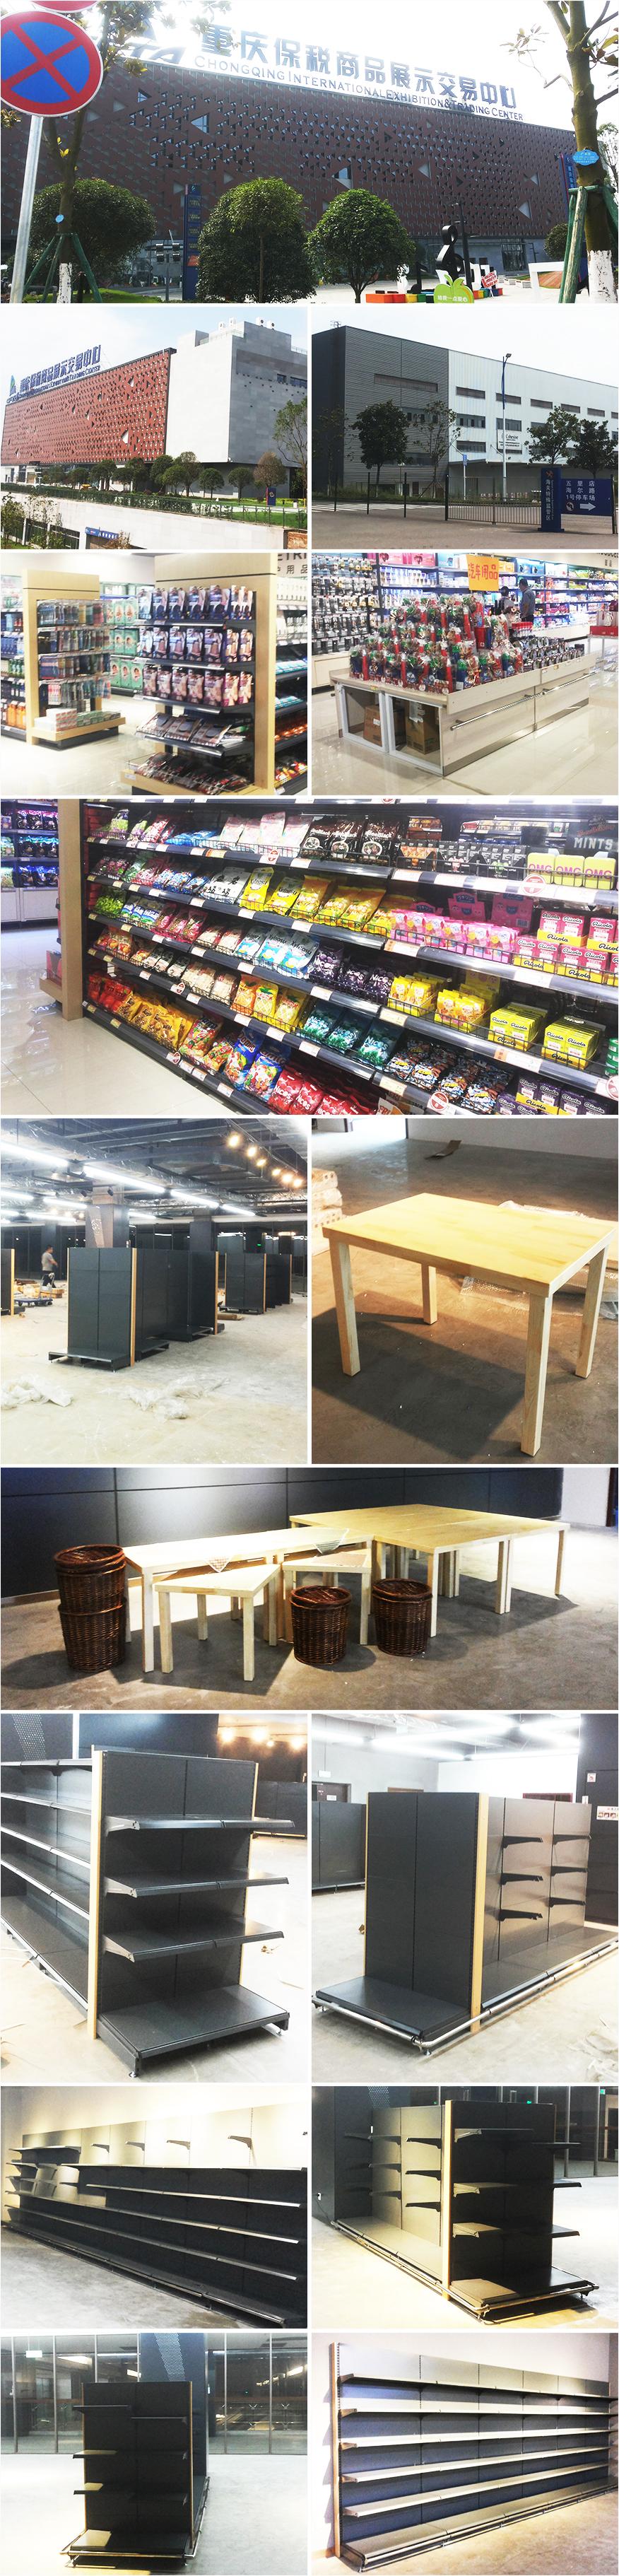 重庆保税区商品展示交易中心,ChongQin international exhibition & trading centre